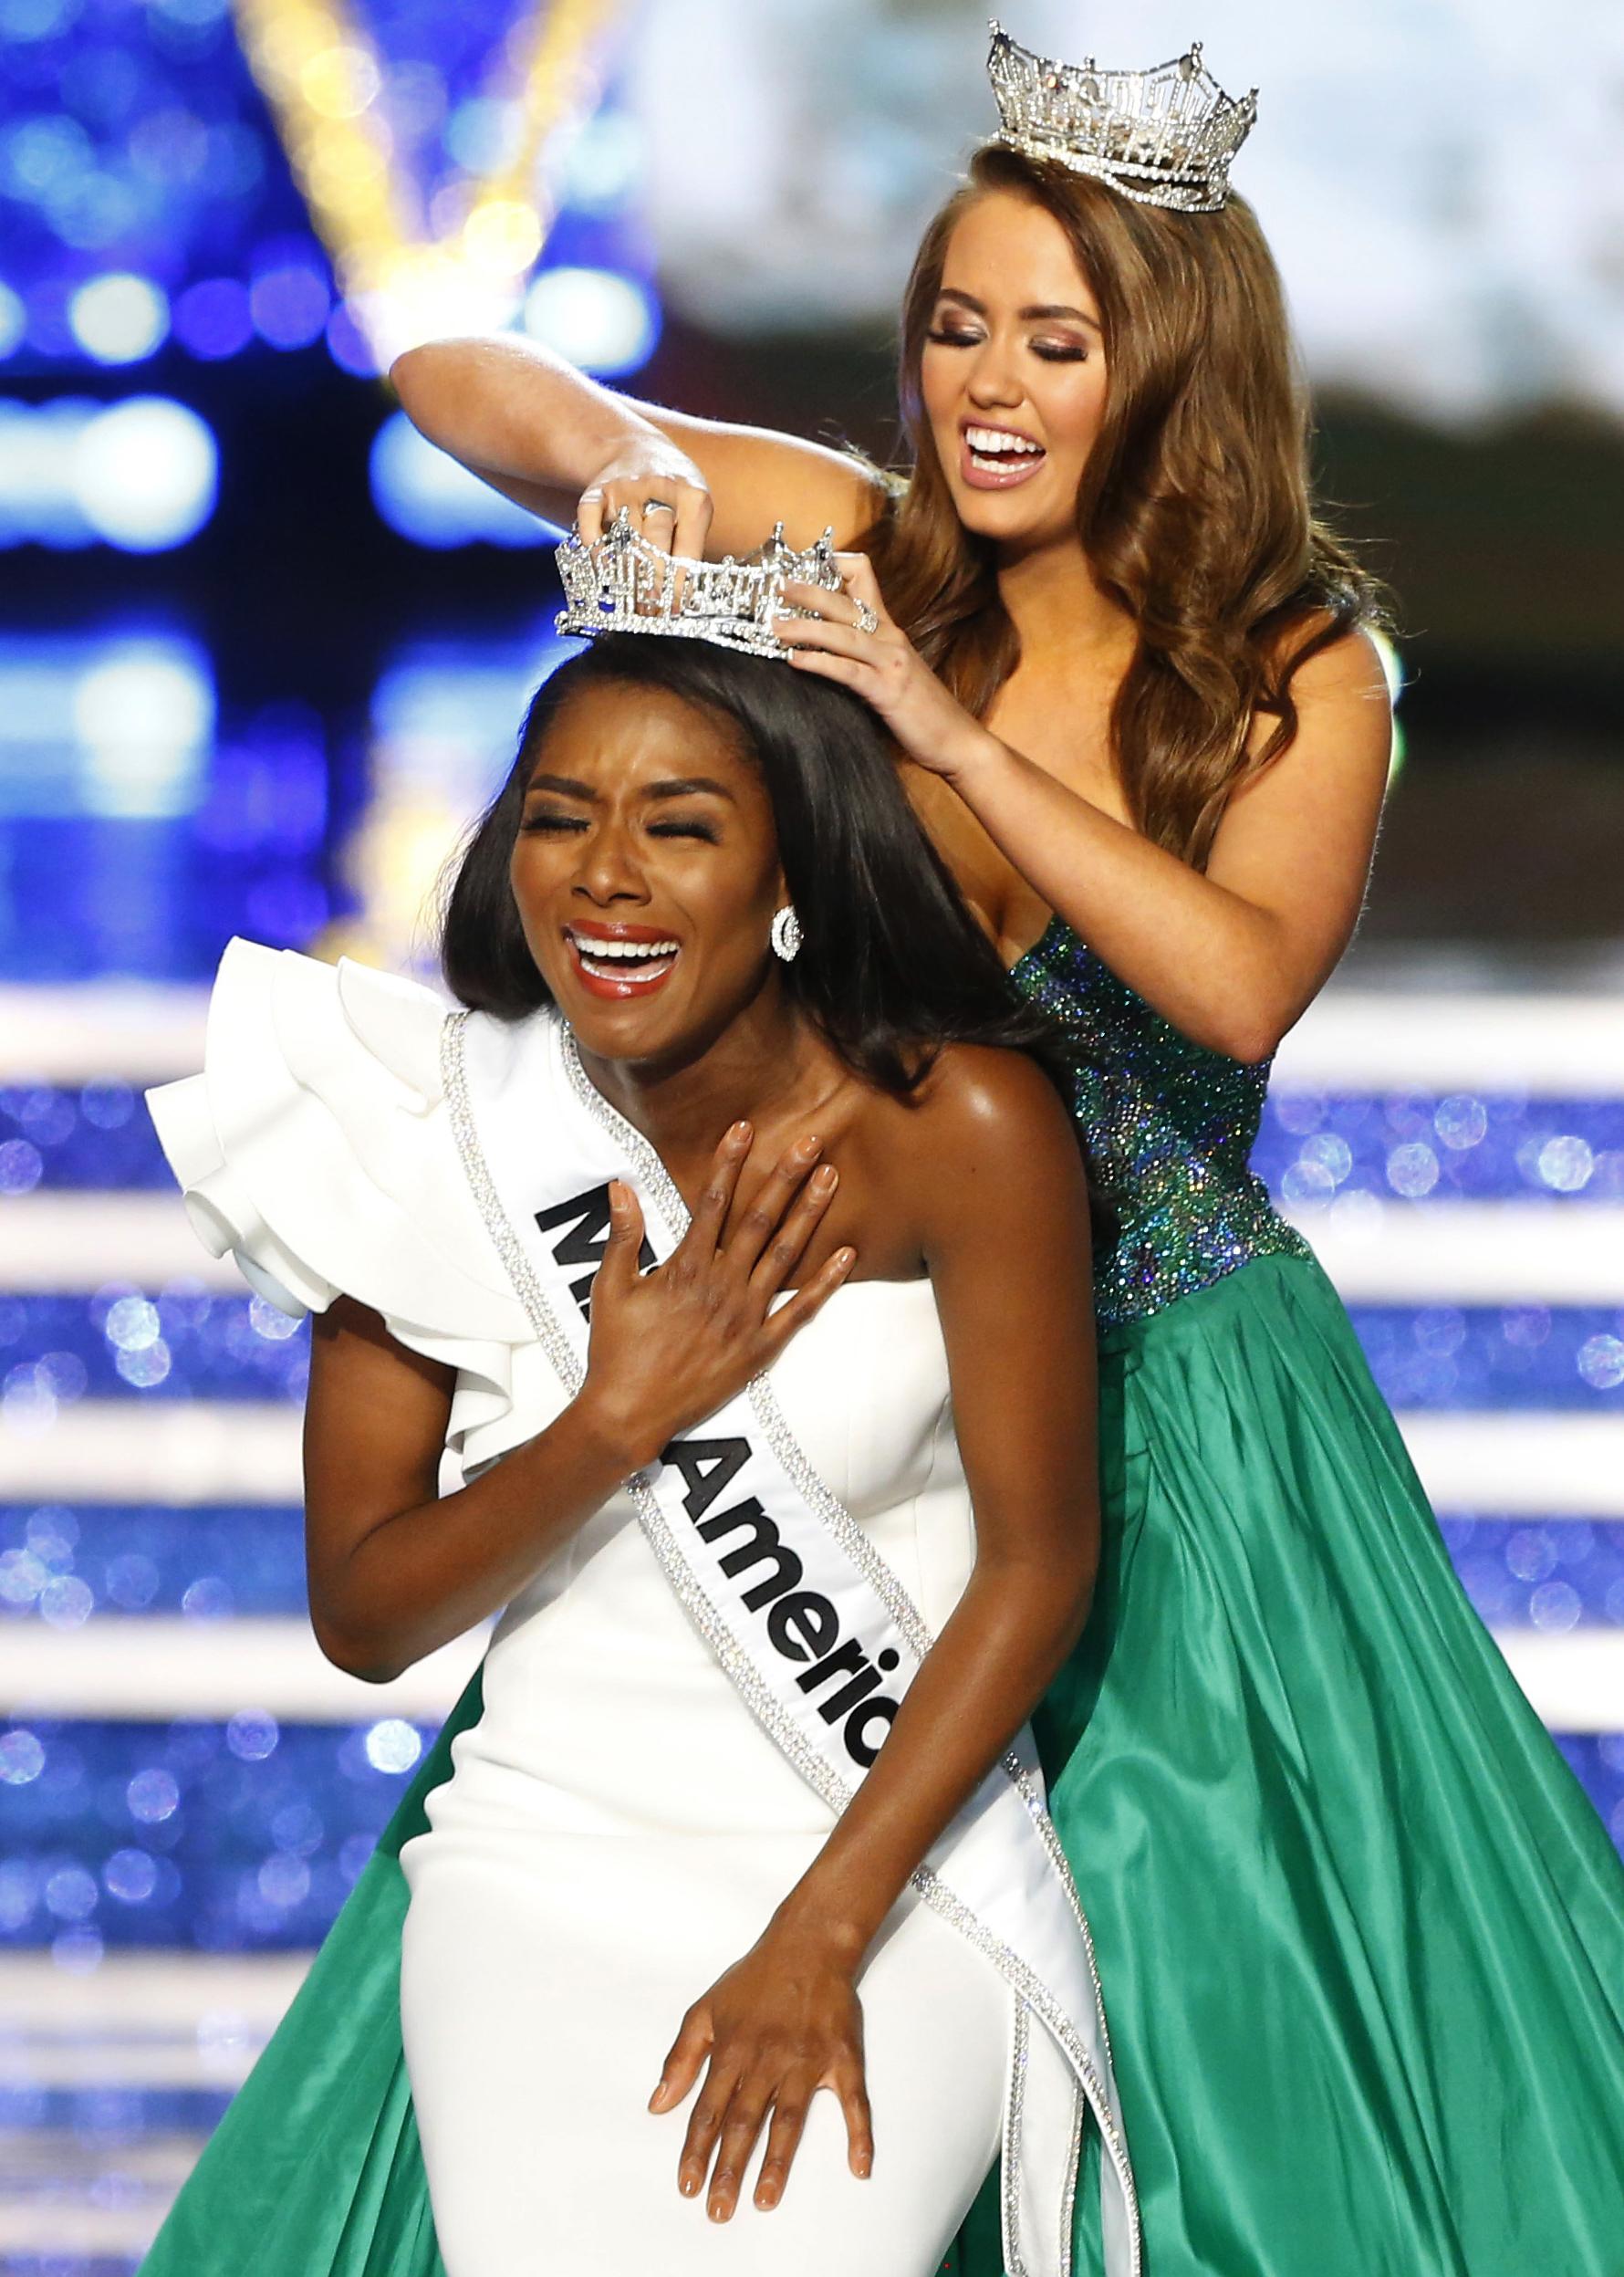 Miss Universe Winner 2013, Gabriela Isler, Stuns In A